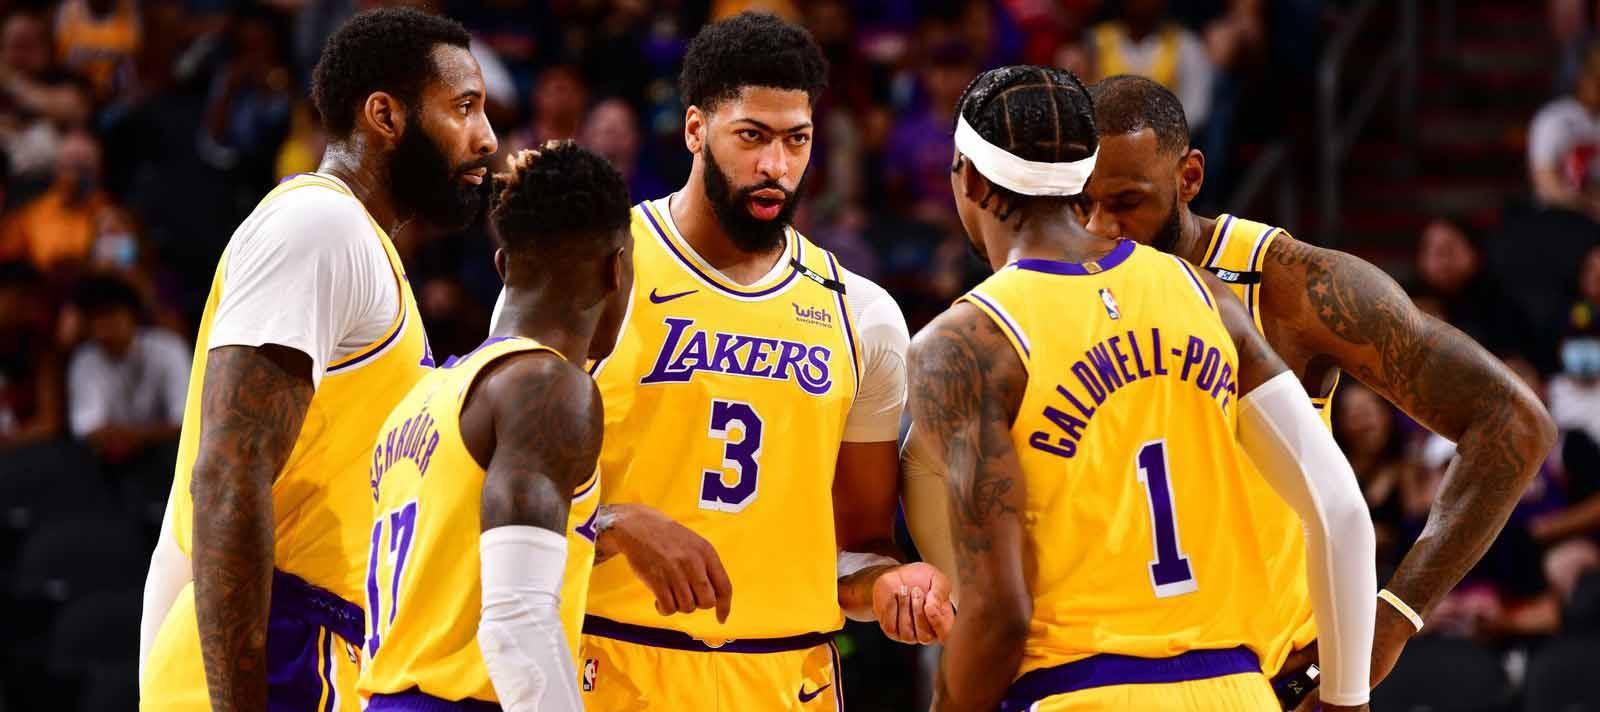 Suns vs Lakers Game 6